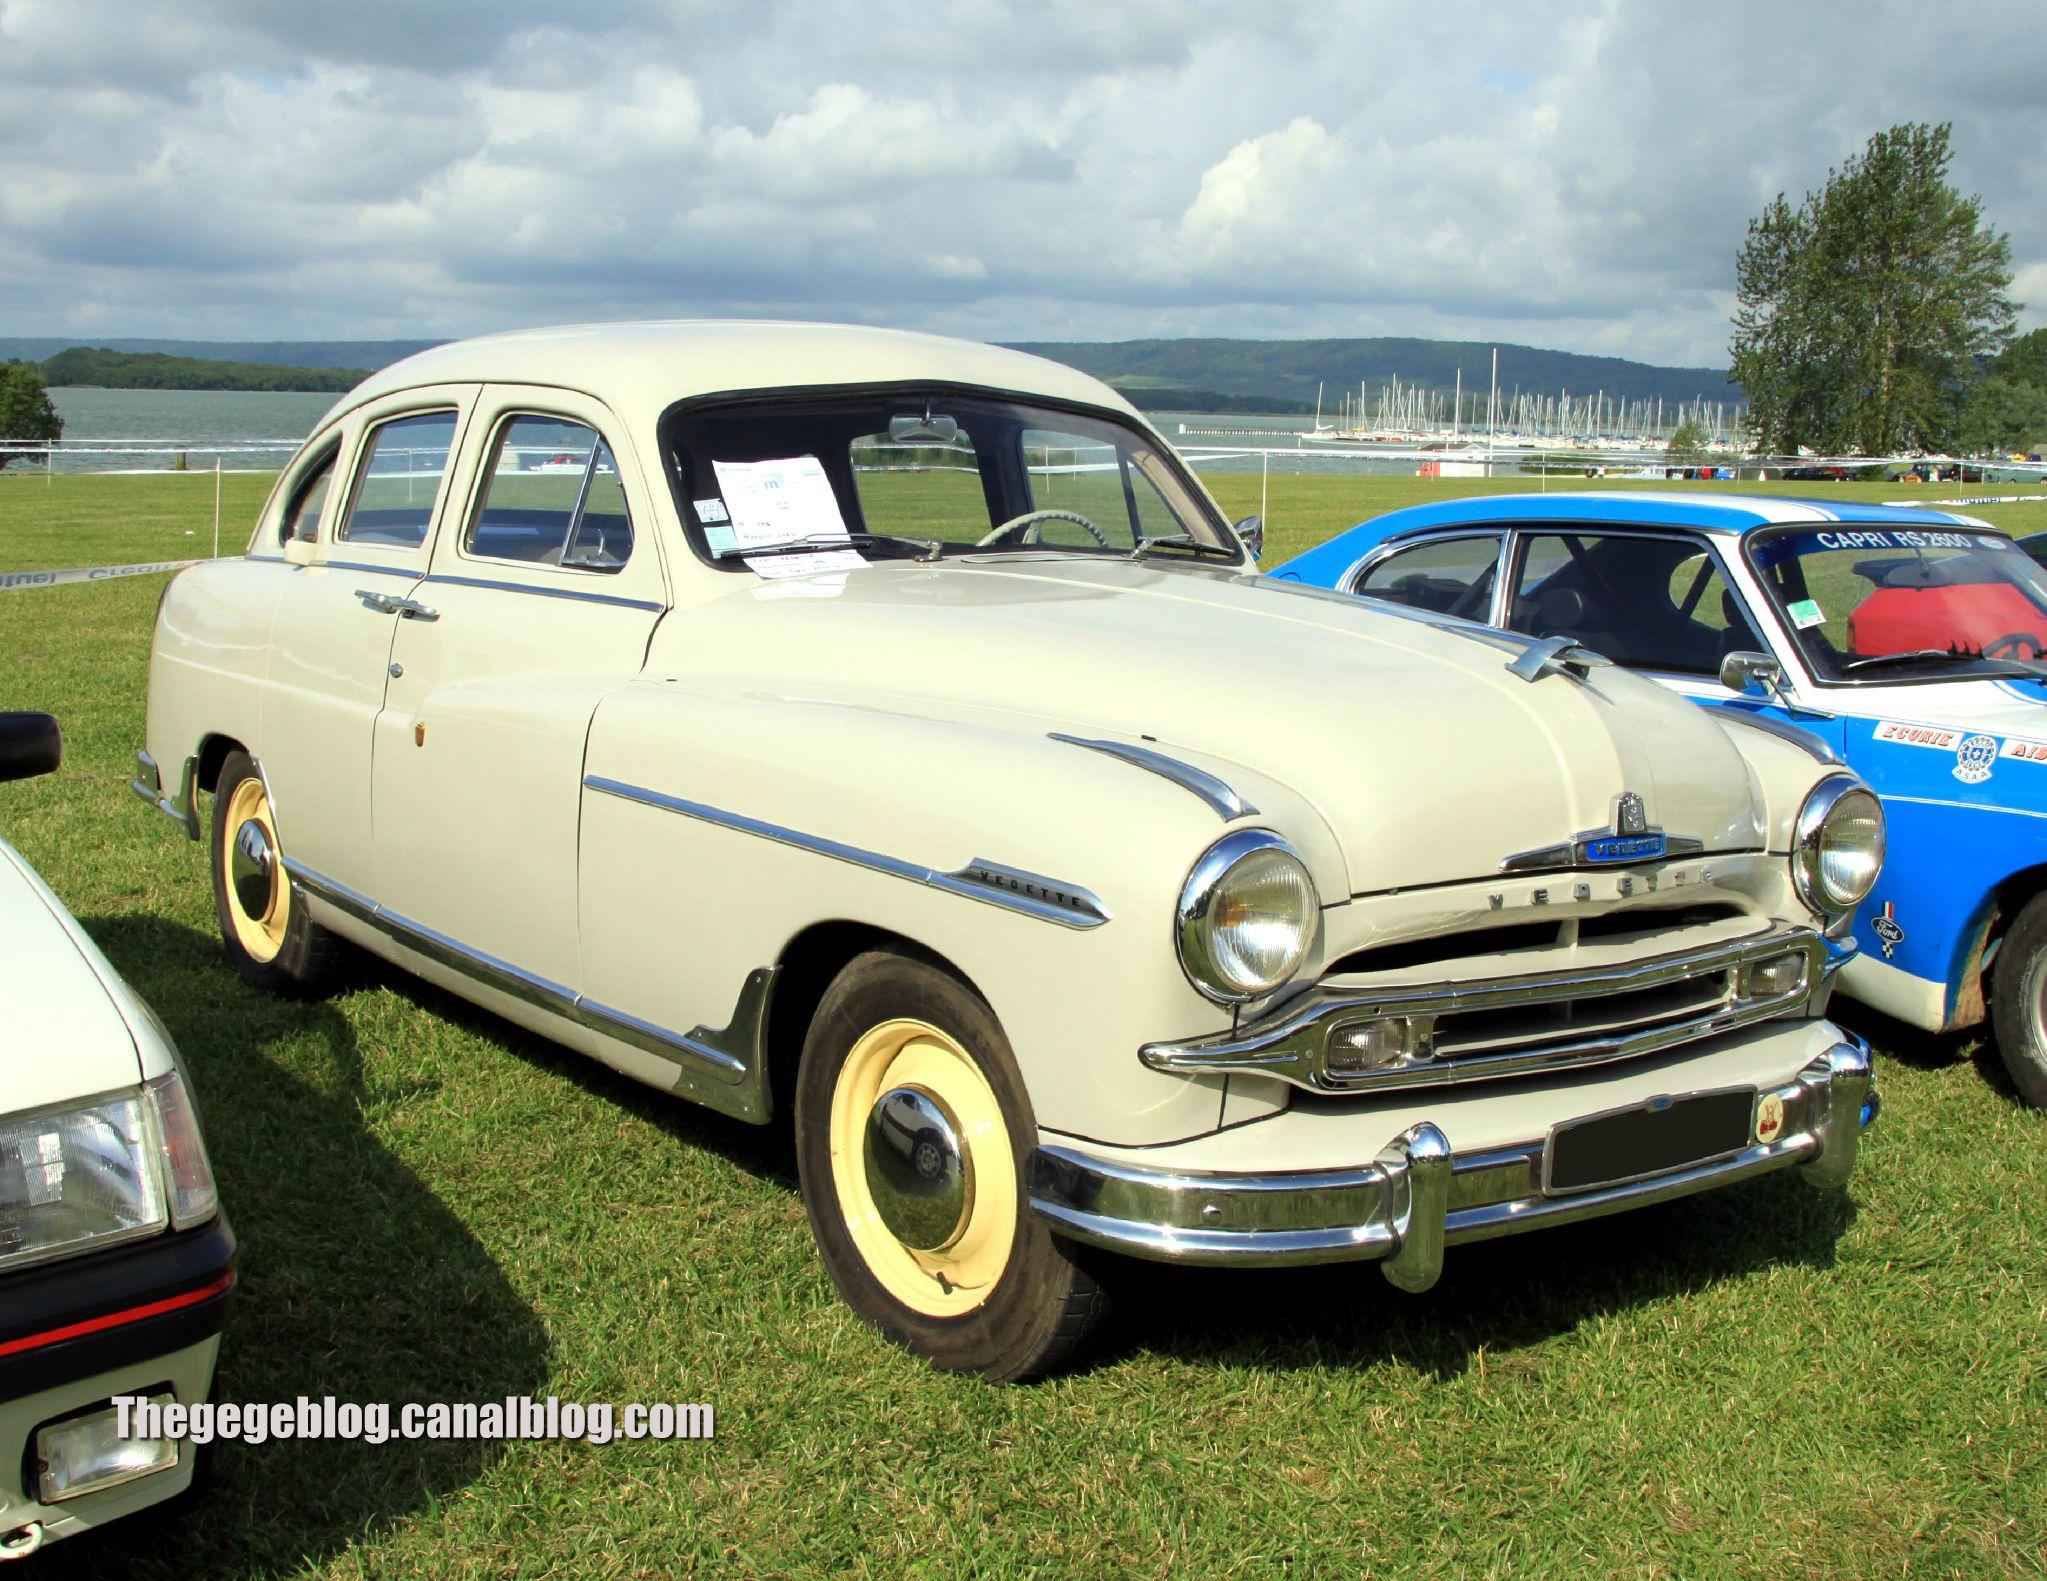 Ford vedette de 1954 retro meus auto madine 2012 the g g blog